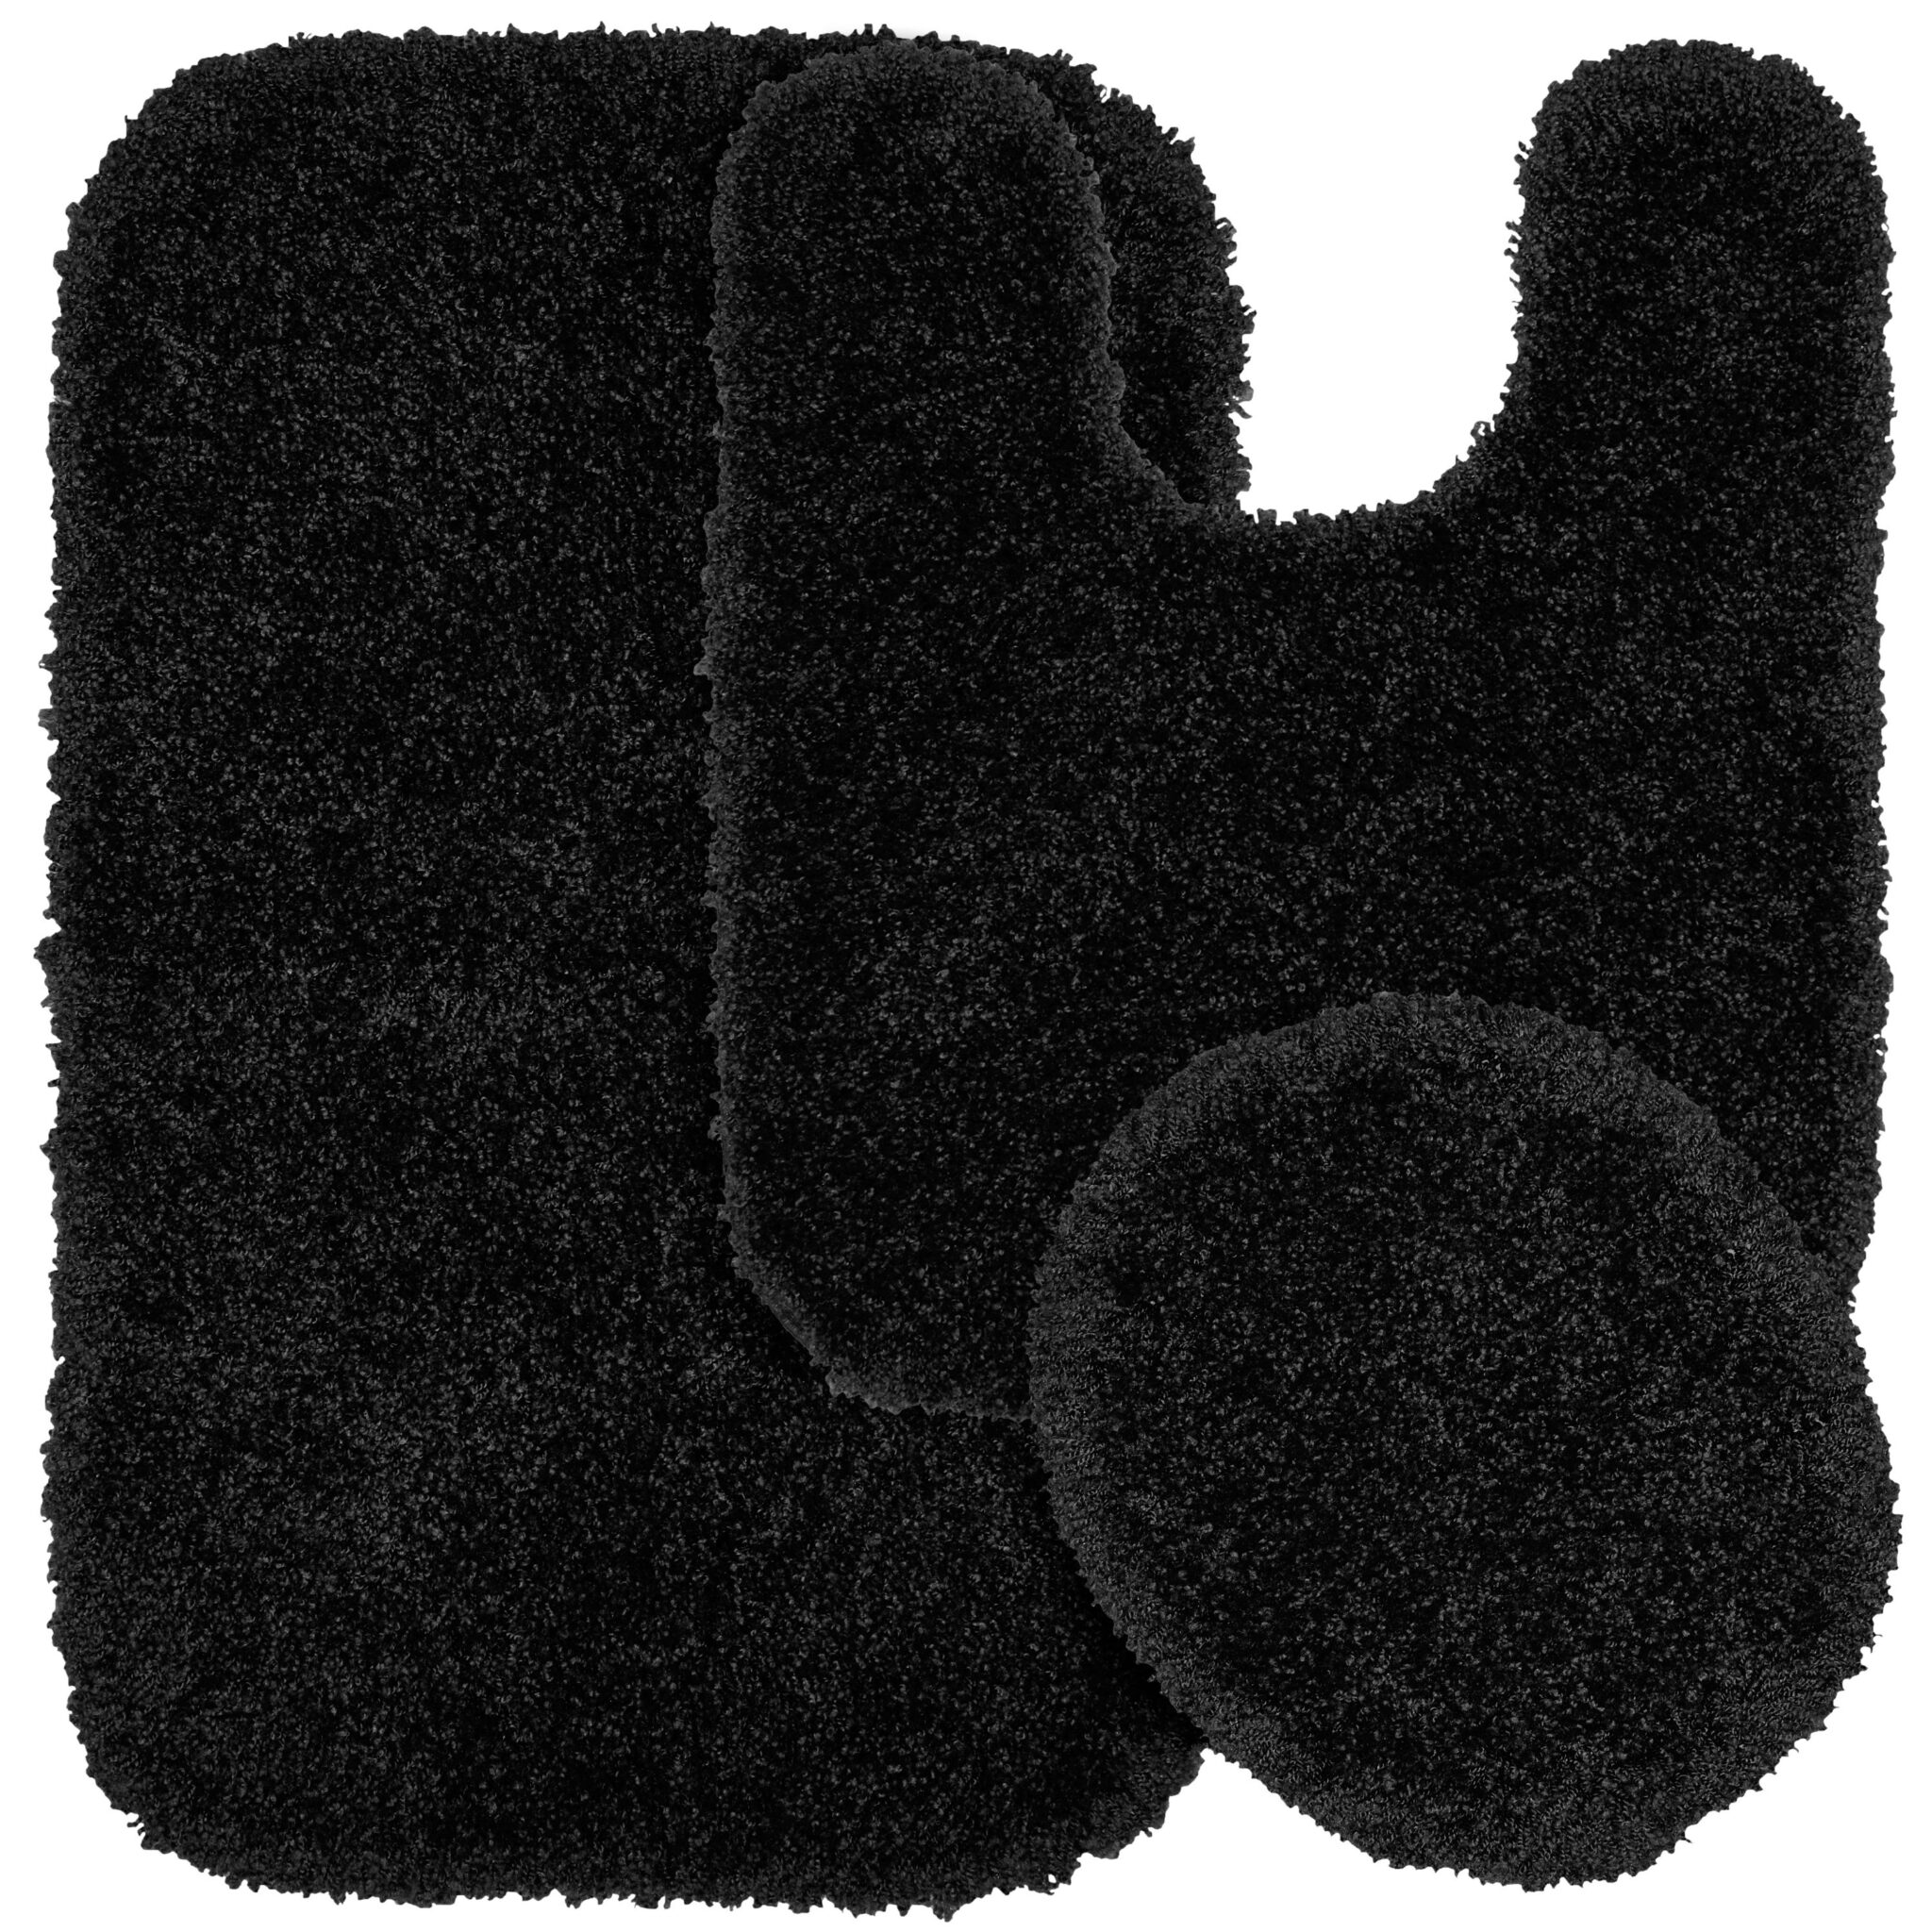 Garland Rug Serendipity Spa Shag Soft & Plush Black 3 Piece Bathroom Rug Set $43.06